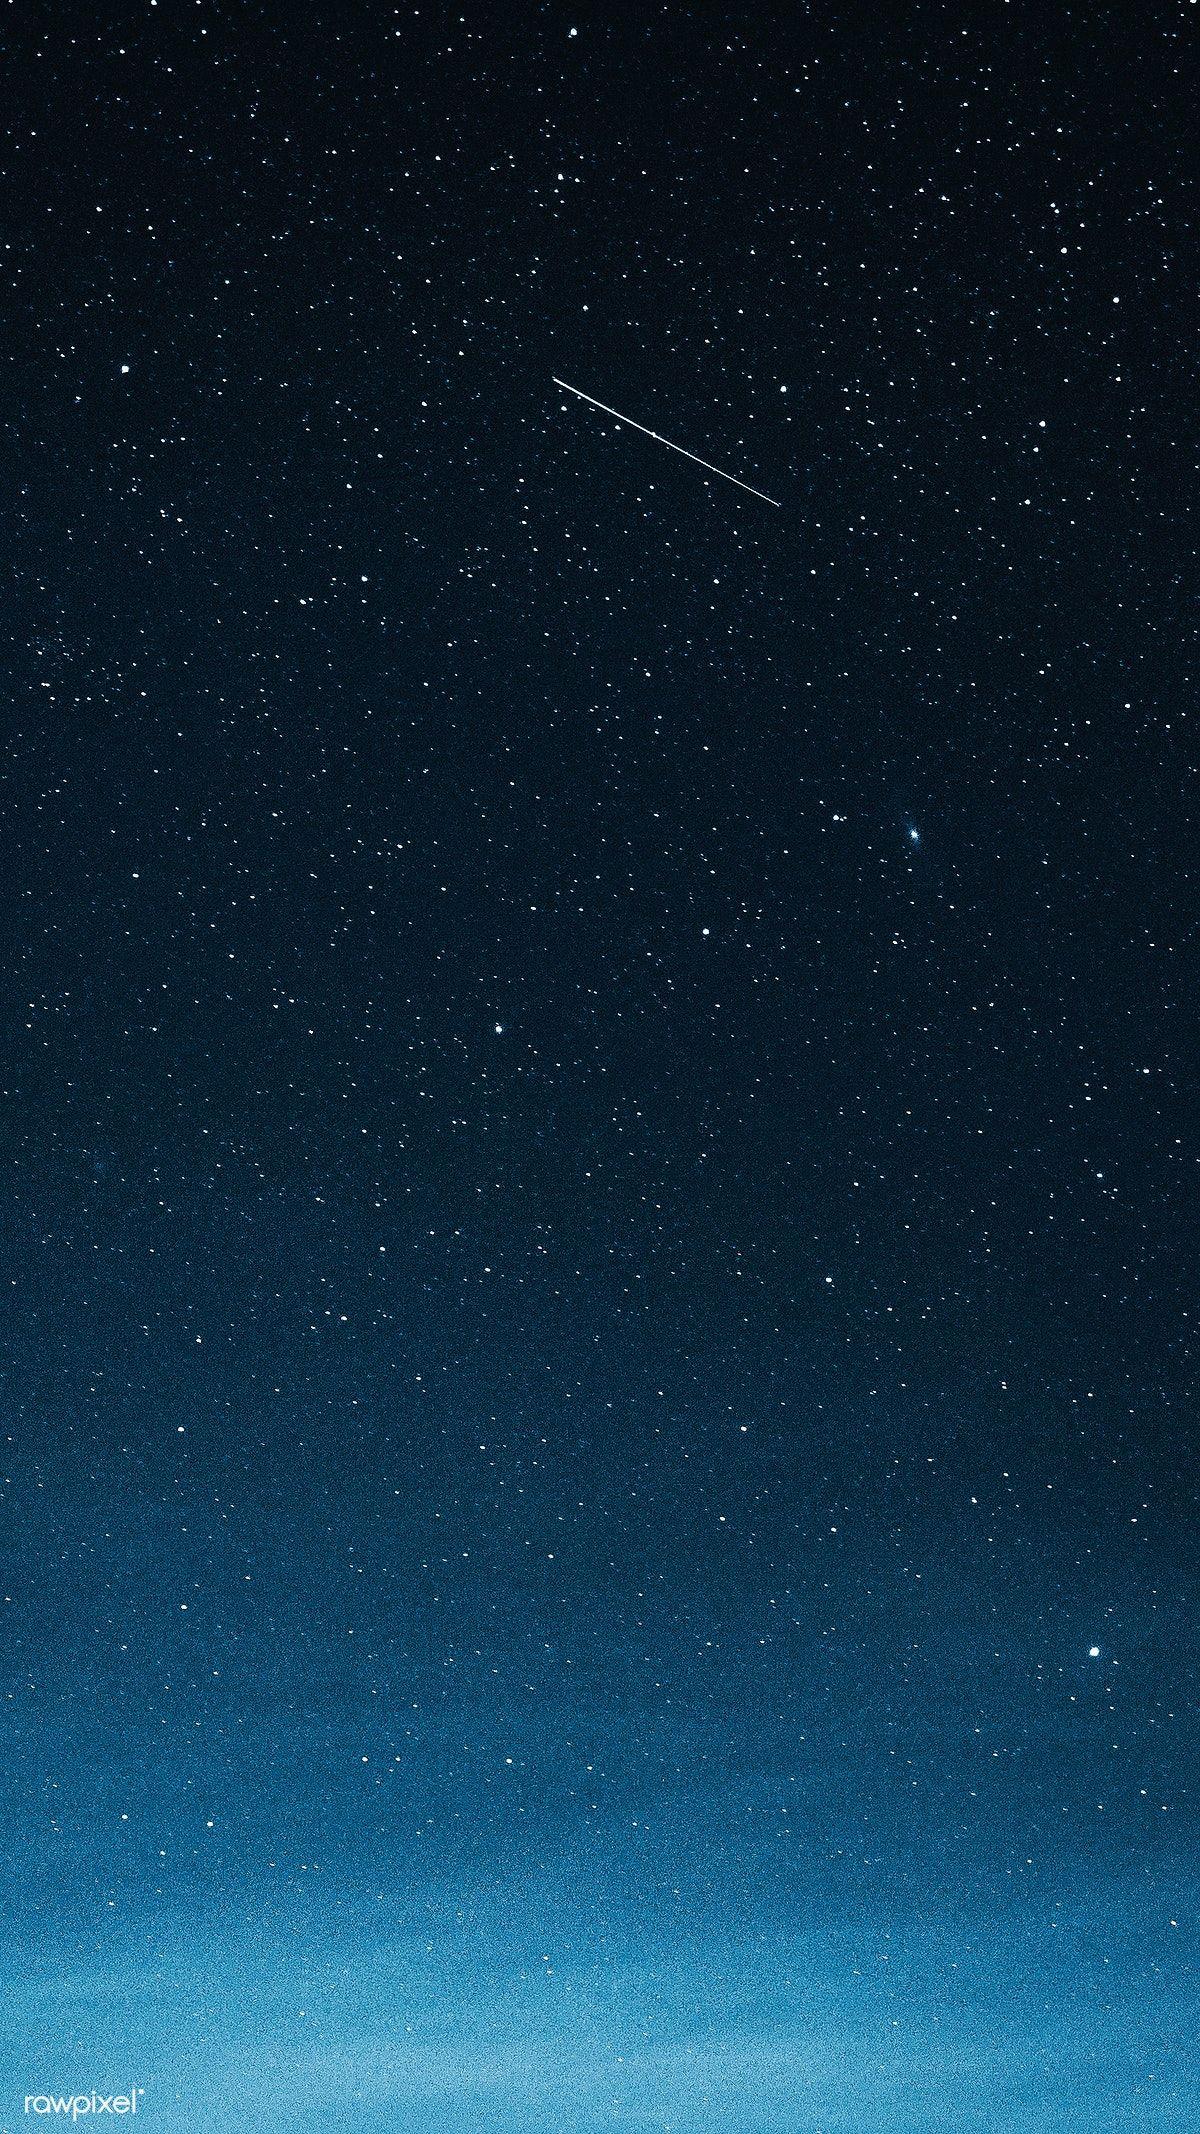 Download Premium Image Of Shooting Star In The Dark Blue Sky Over Dark Blue Wallpaper Blue Sky Wallpaper Night Sky Wallpaper Aesthetic dark blue sky wallpaper